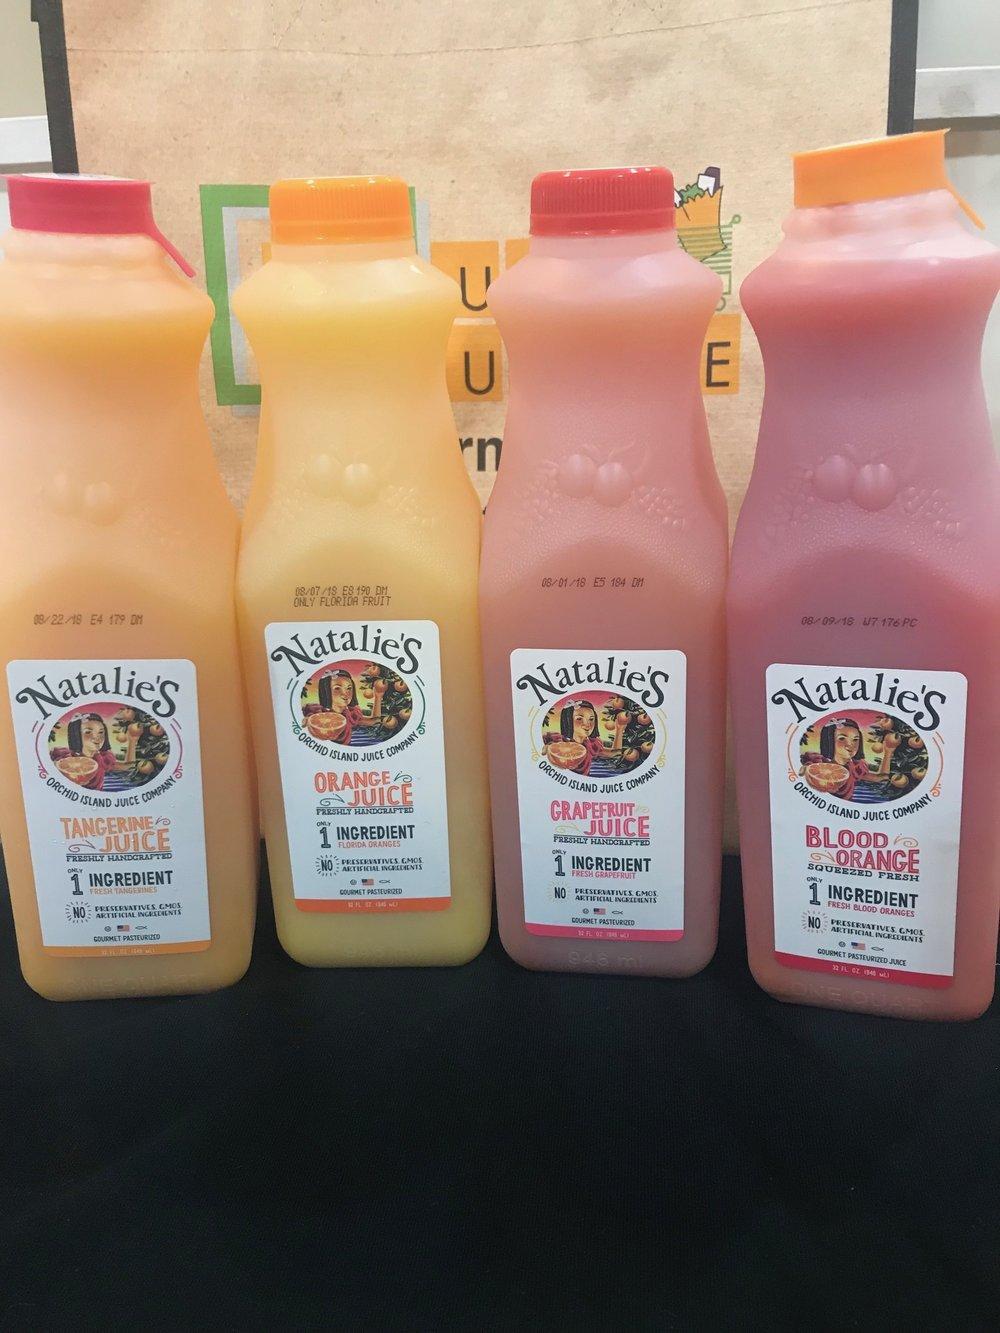 Natalie's Natural Juice